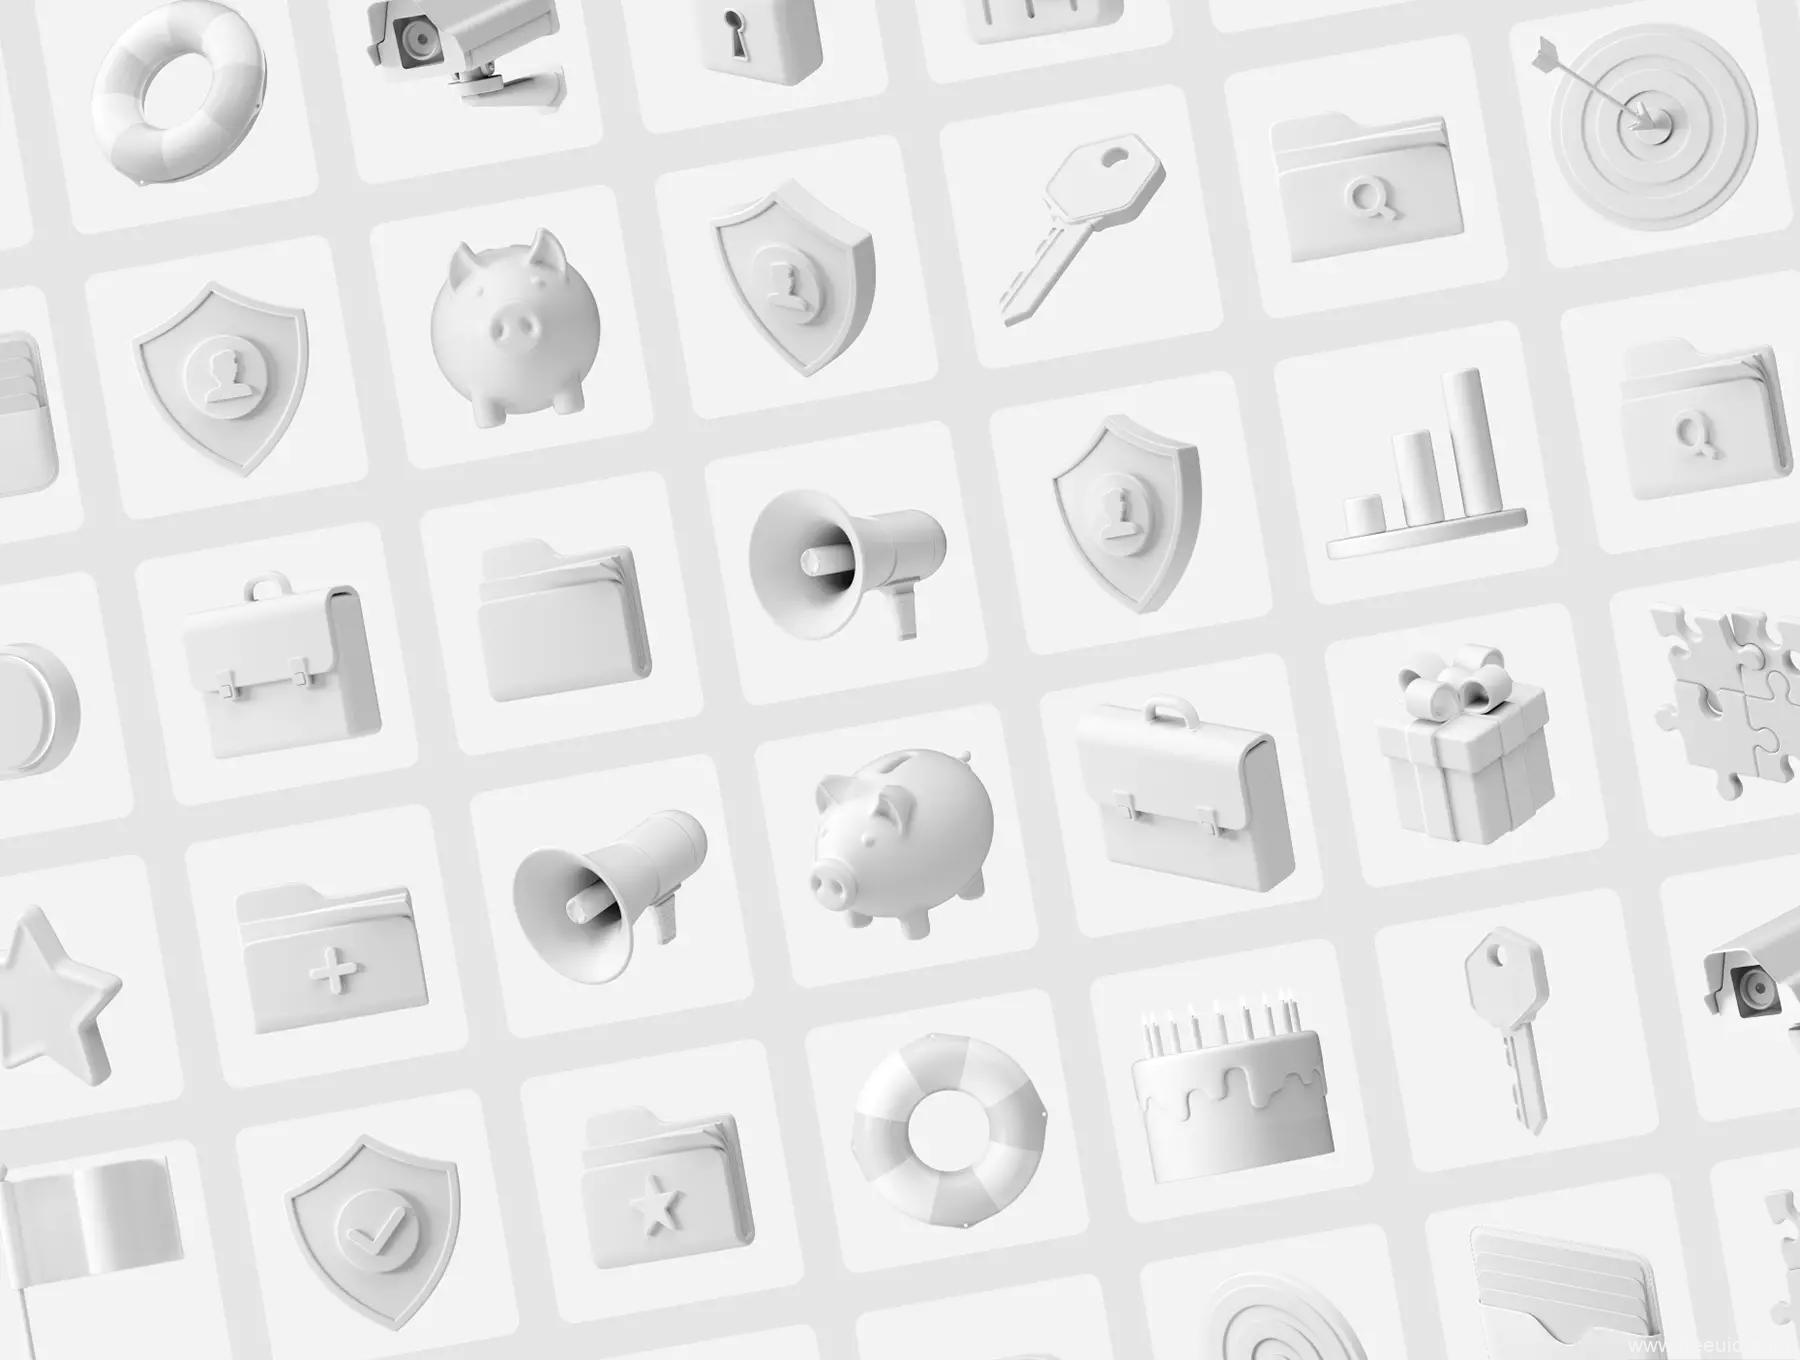 一套精美的3D图标icon源文件,C4D运营图标icon源文件,3D风UI图标源文件,figma、C4D源文件